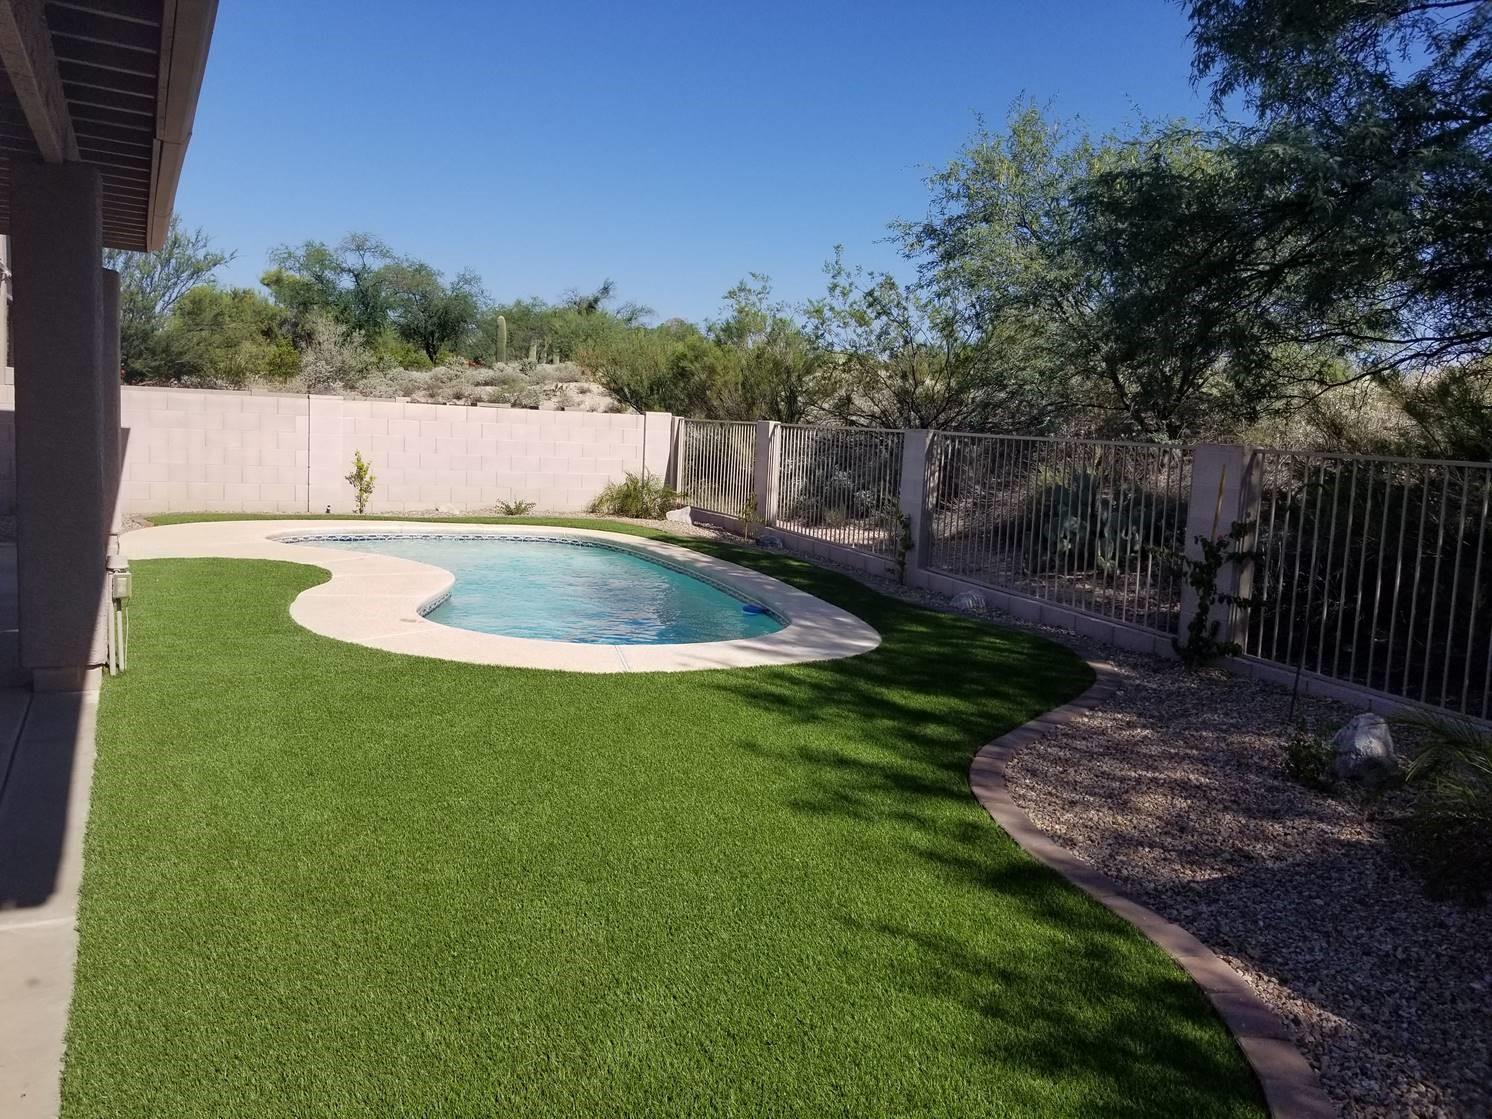 grass pool.jpg